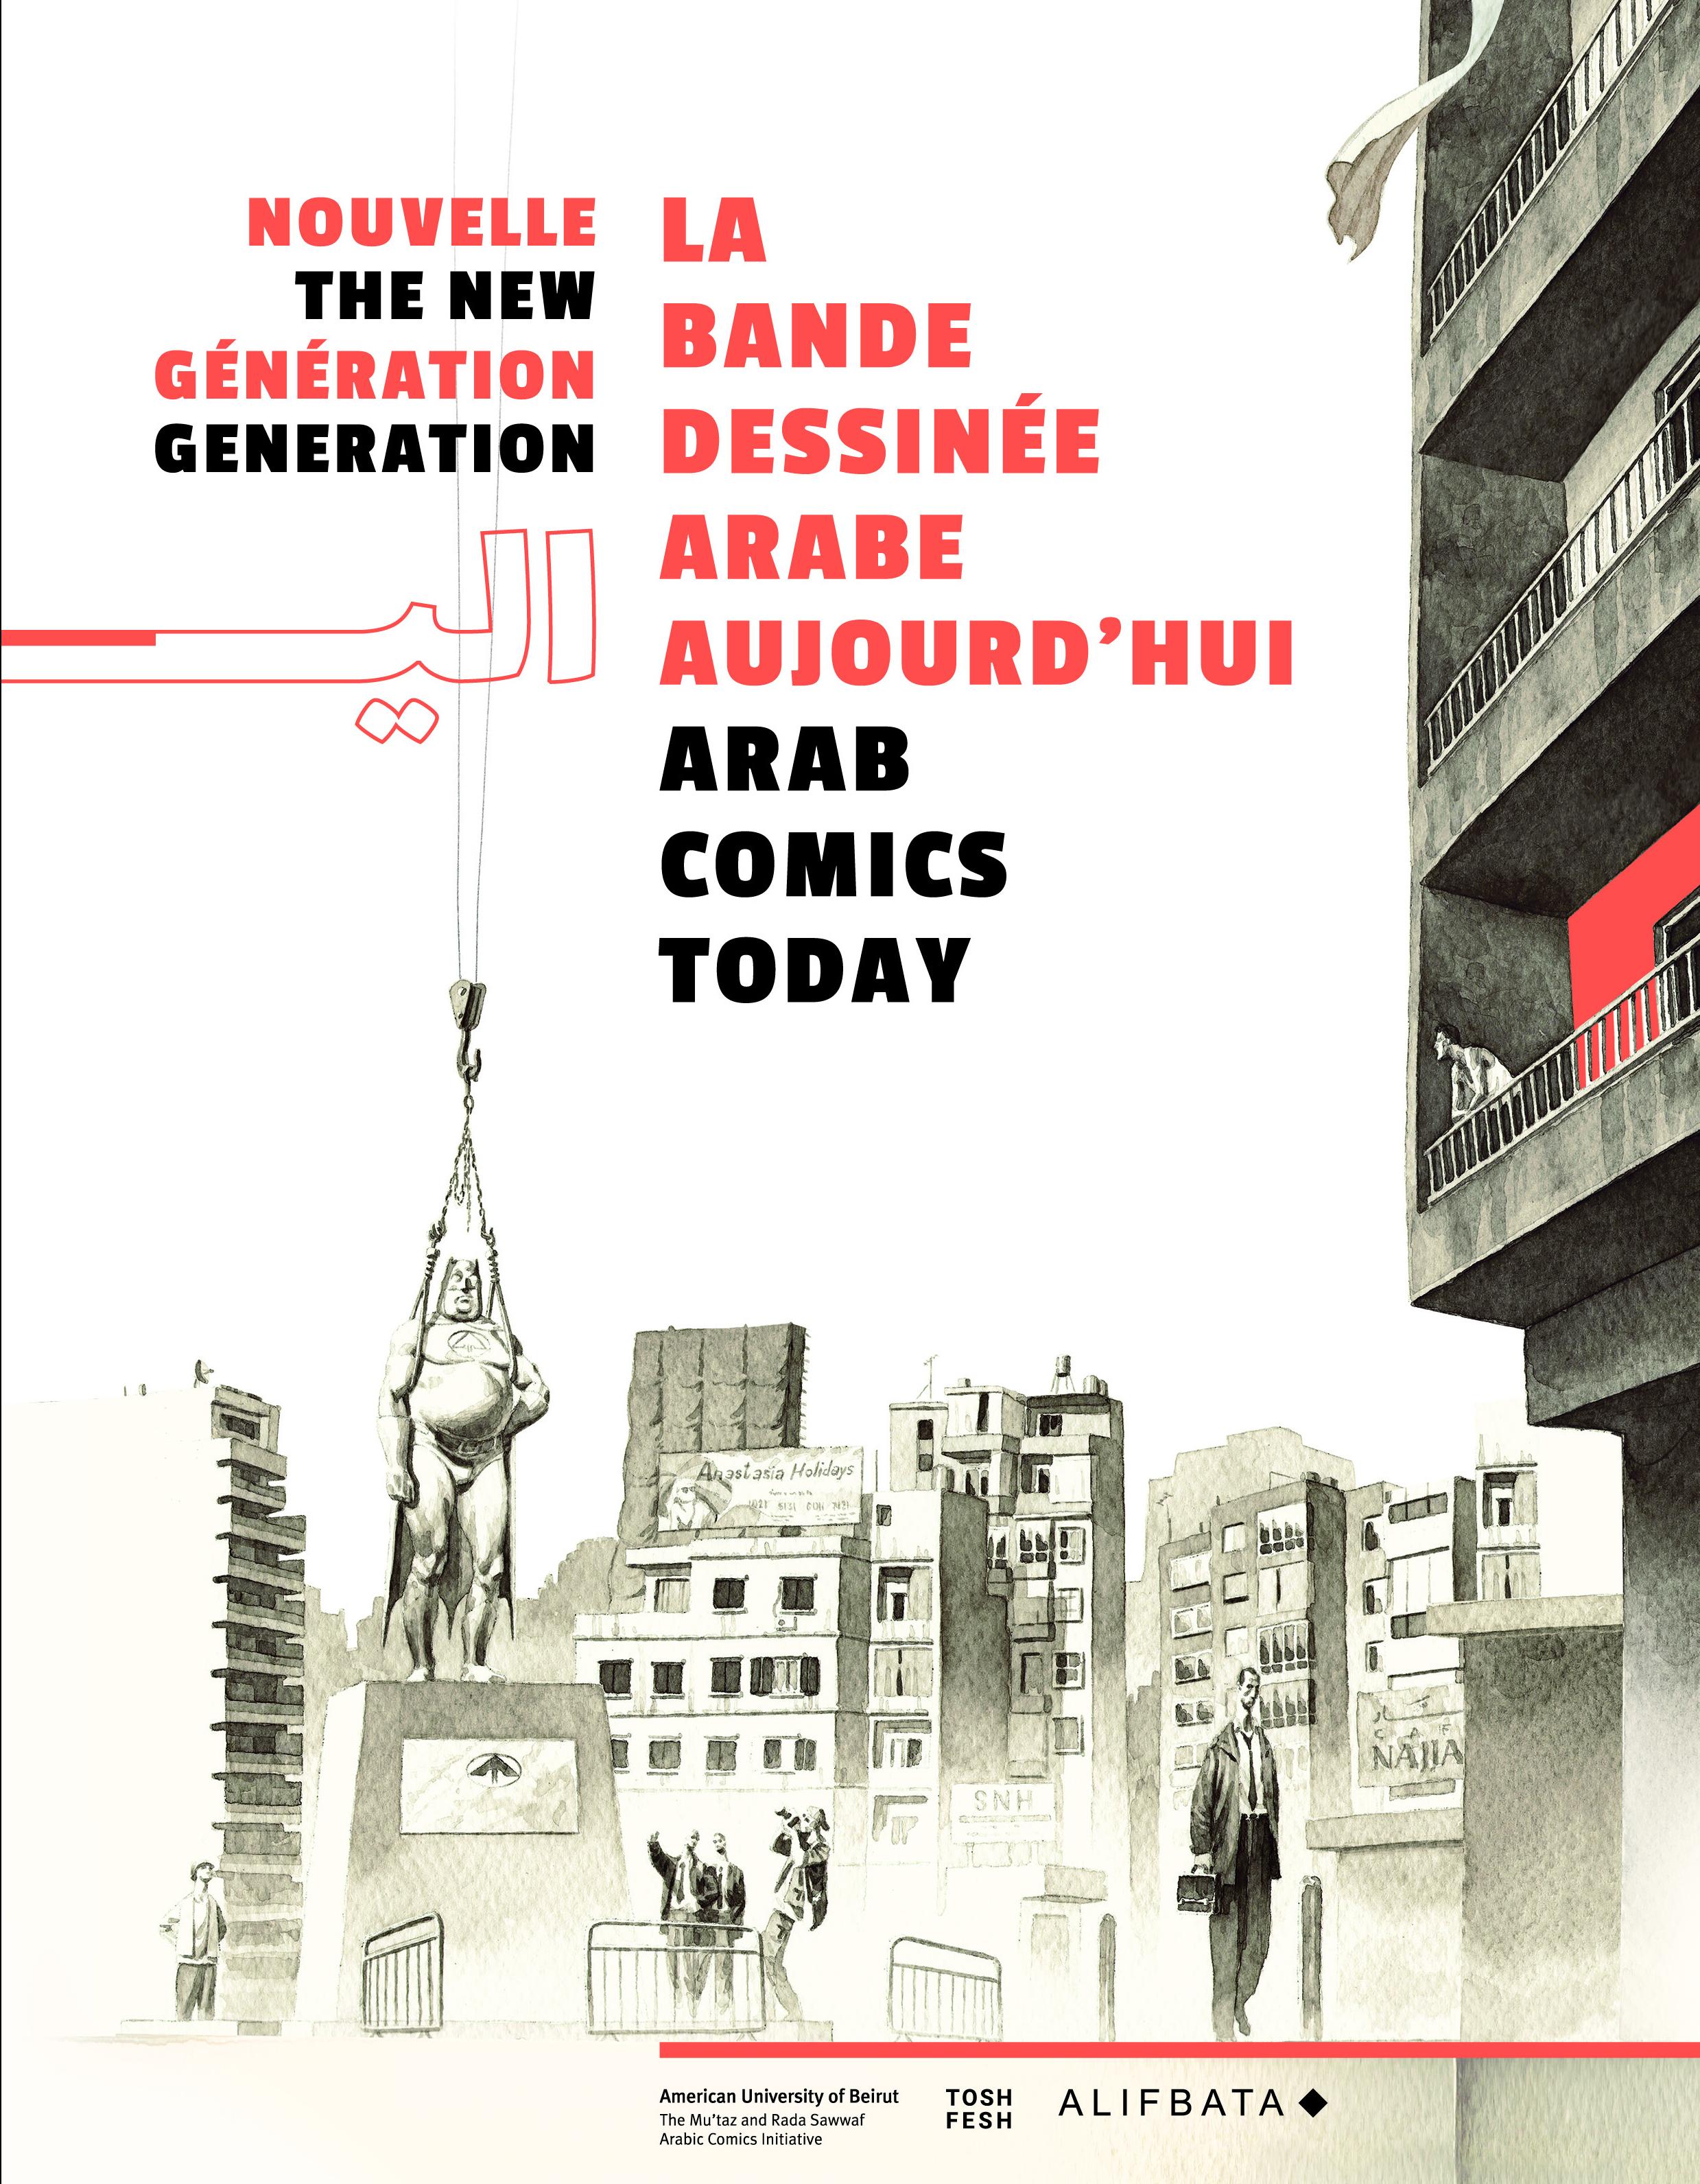 NOUVELLE GENERATION : LA BANDE DESSINEE ARABE AUJOURD'HUI / ARAB COMICS TODAY